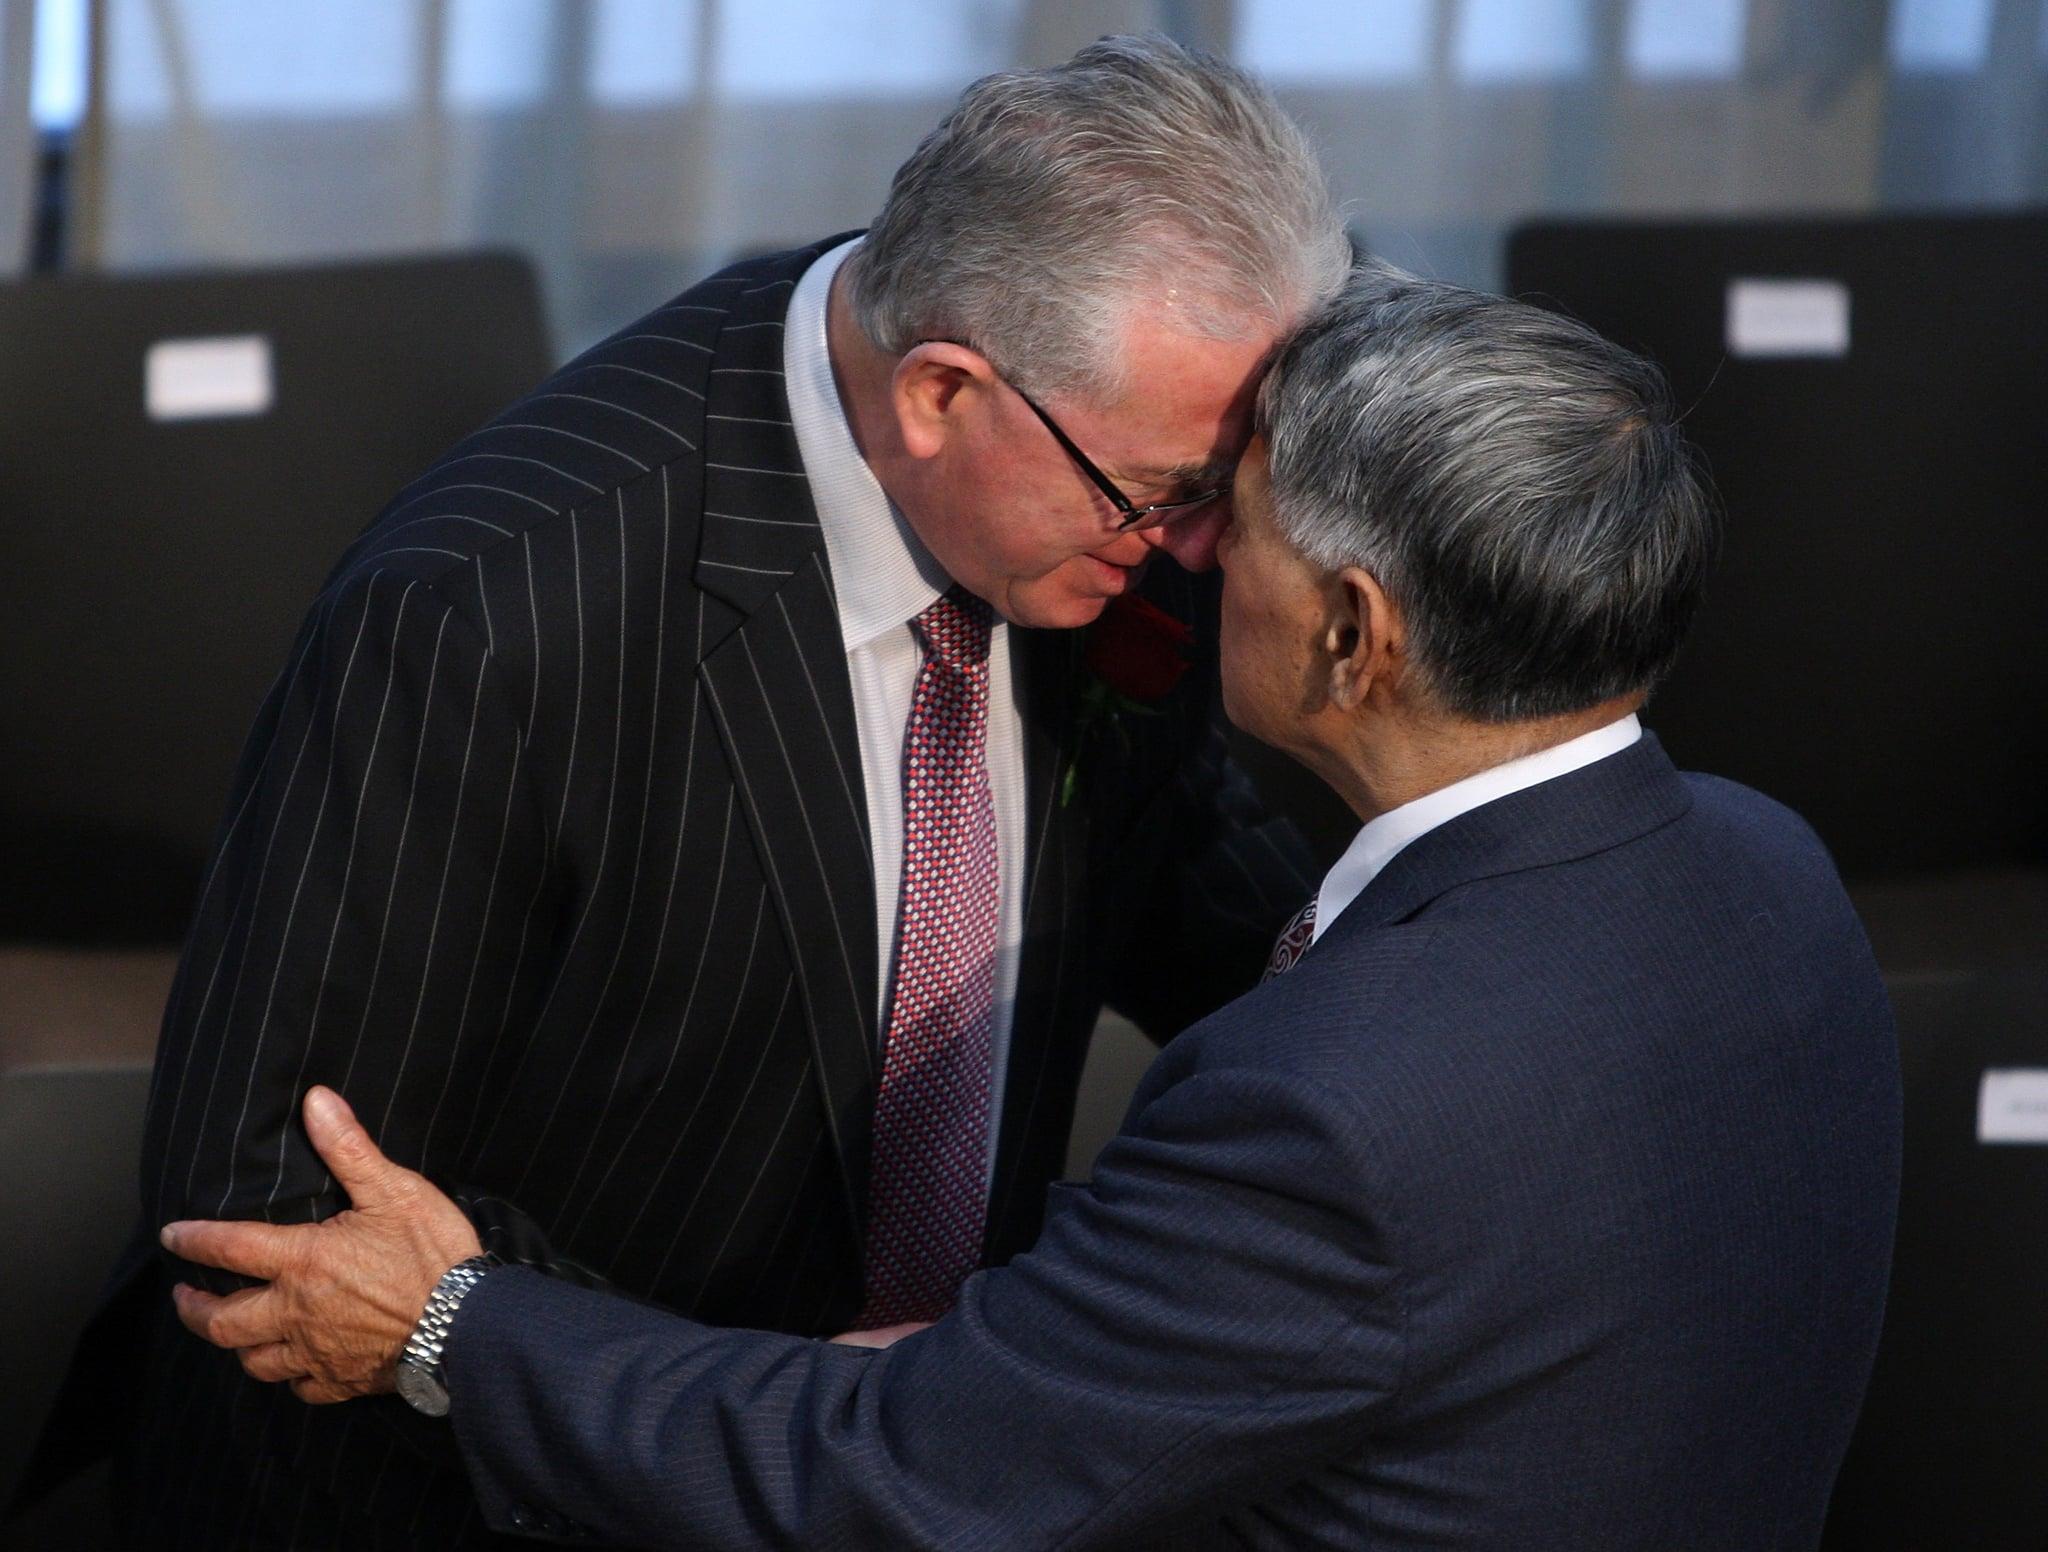 Treaty Negotiations minister Dr Michael Cullen hongis (maori greeting) Te Atiawa kaumatua Sam Jackson during the signing.